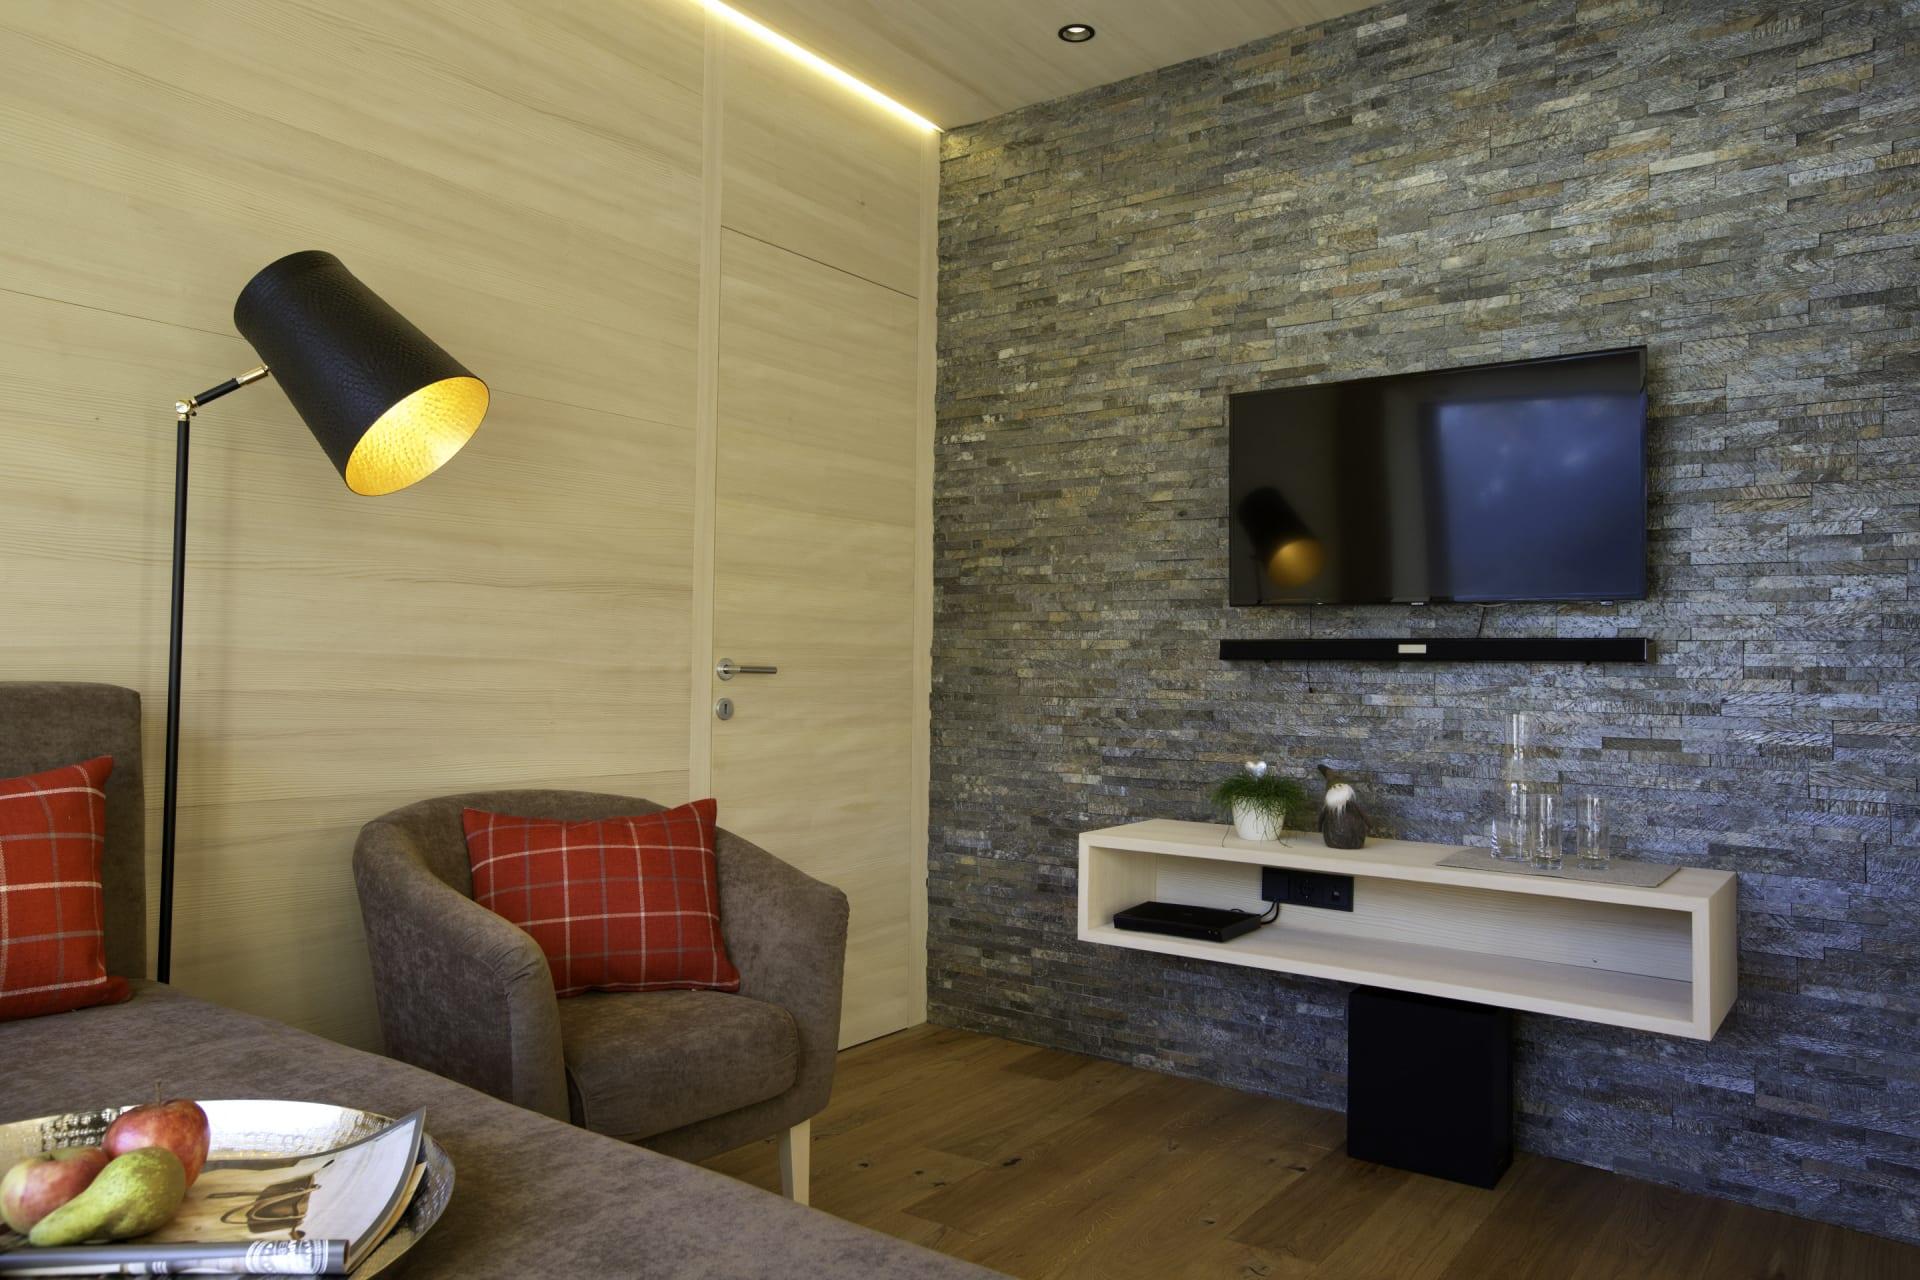 n 03 Apartment 2-5 Personen